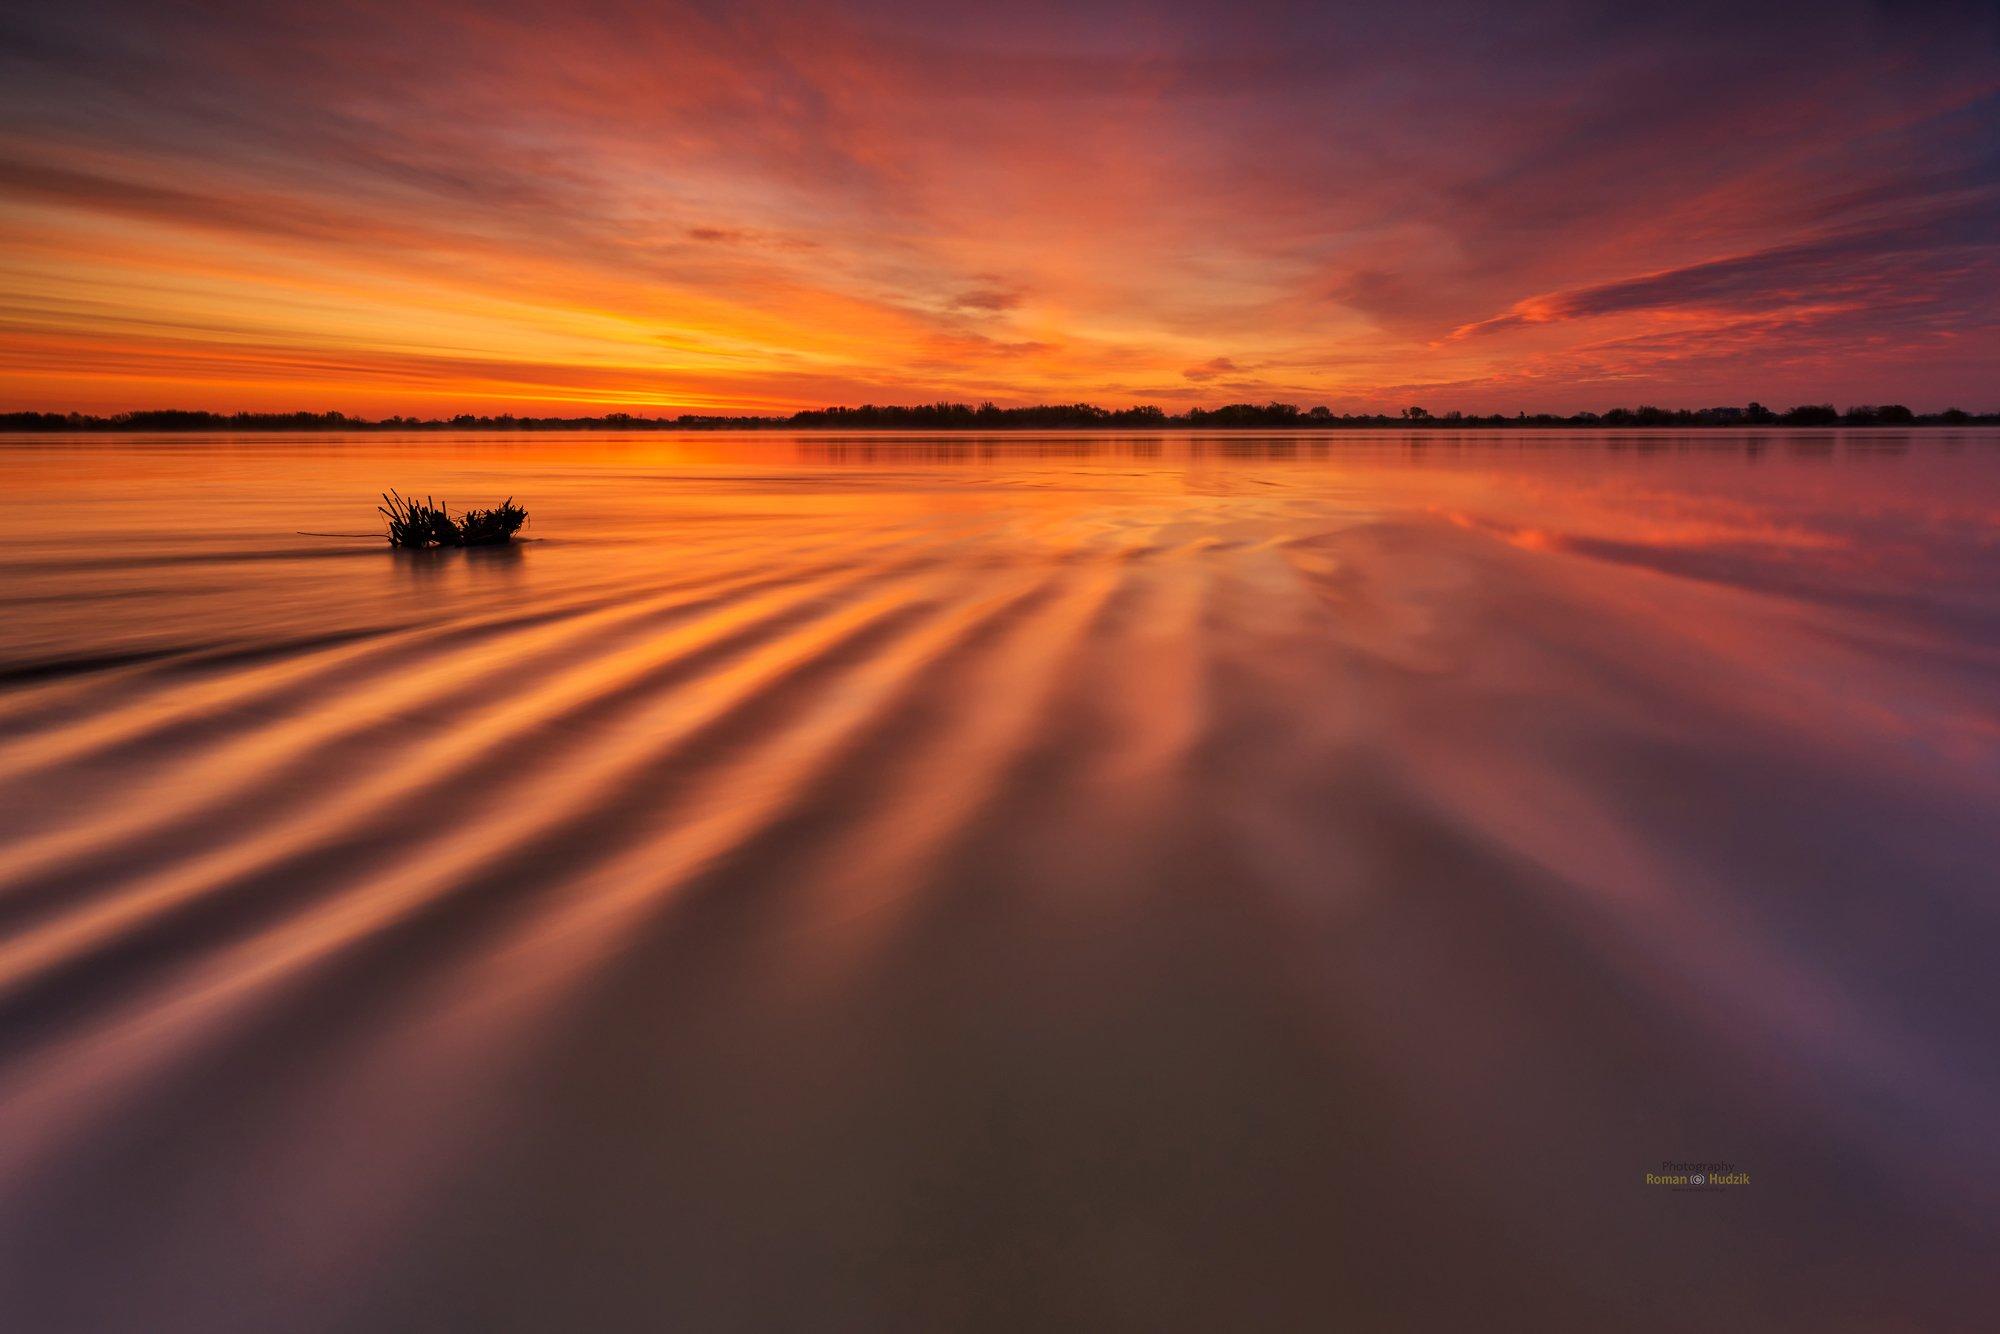 water, landscape, sunrise, clouds, colors, wrinkles,, Hudzik Roman